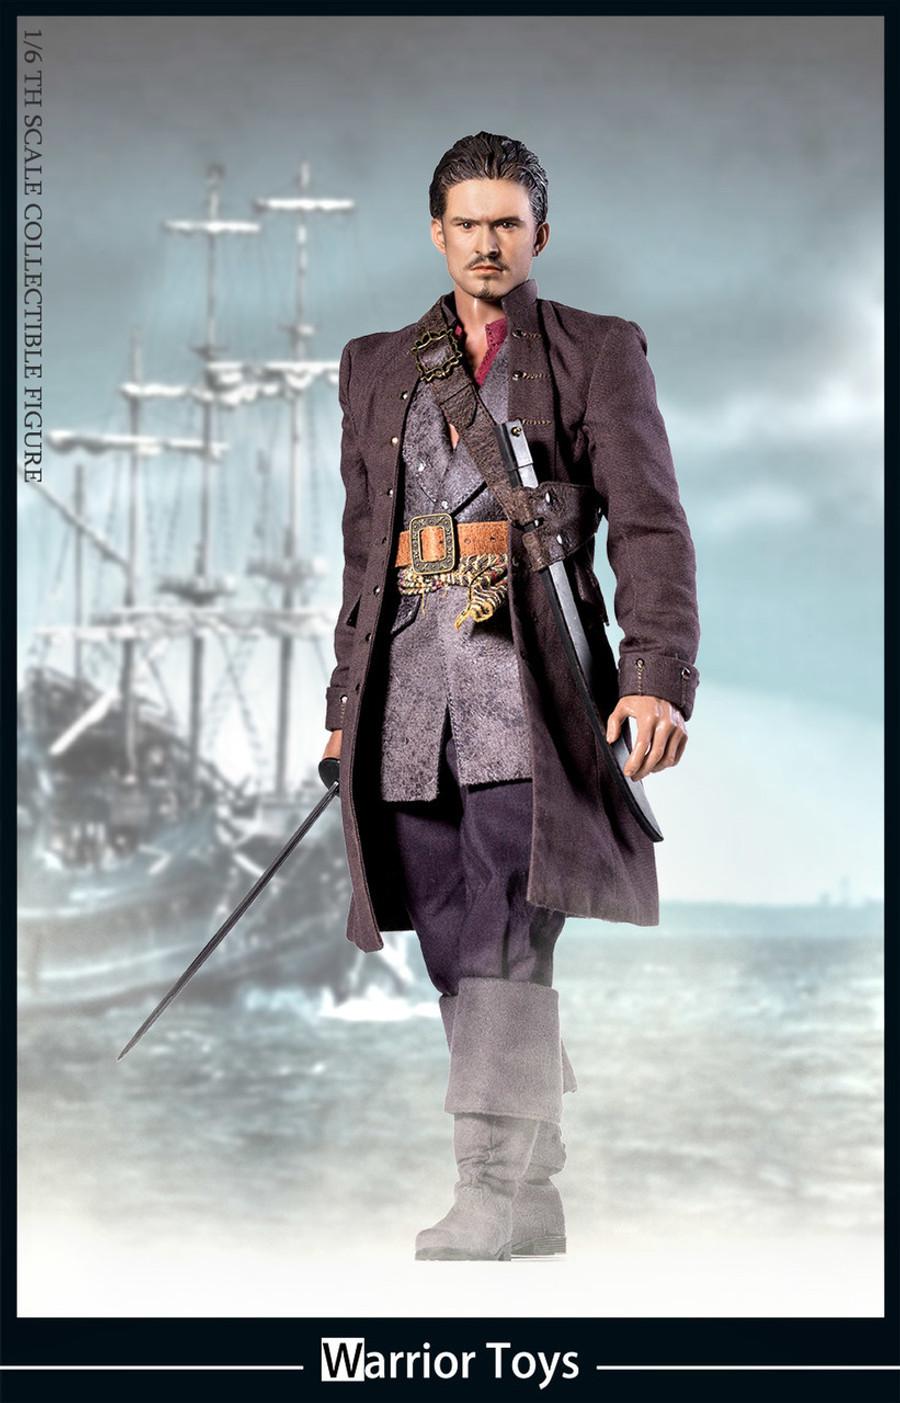 Warrior Toys - Pirate Captain